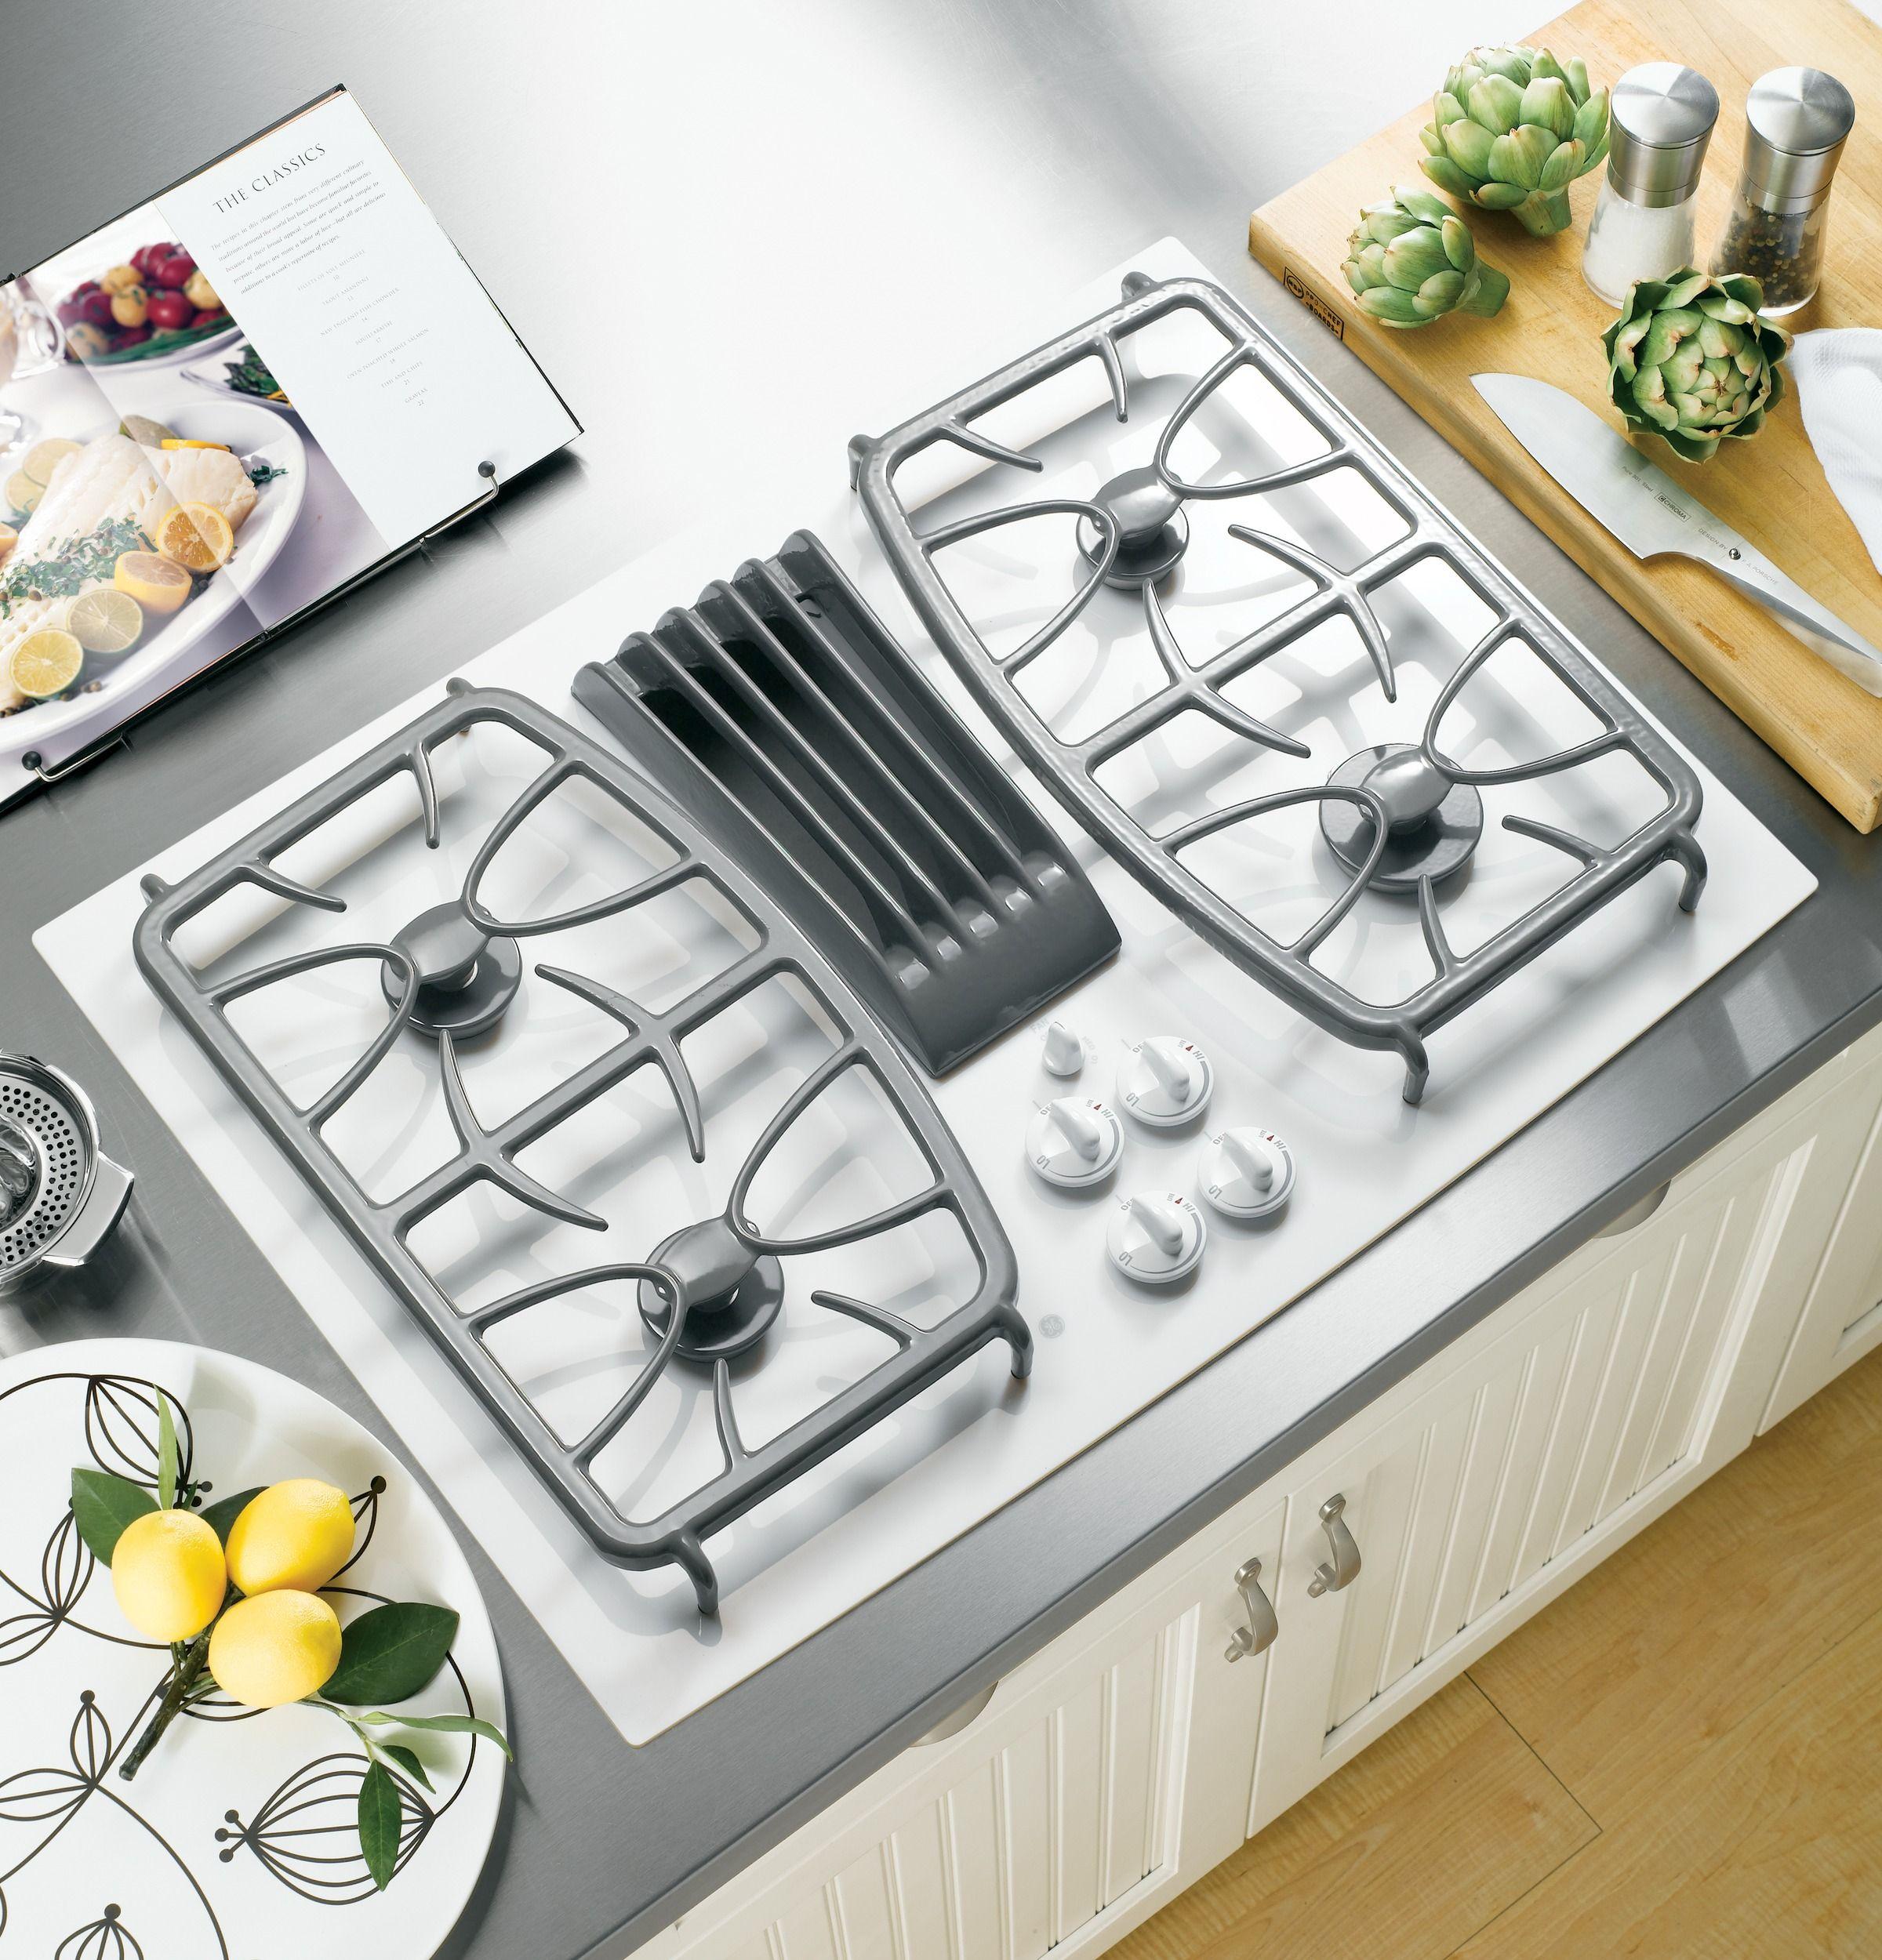 27 Best 36 Gas Downdraft Cooktop Unique Ideas In 2019 Stove Kitchen Appliances Kitchen